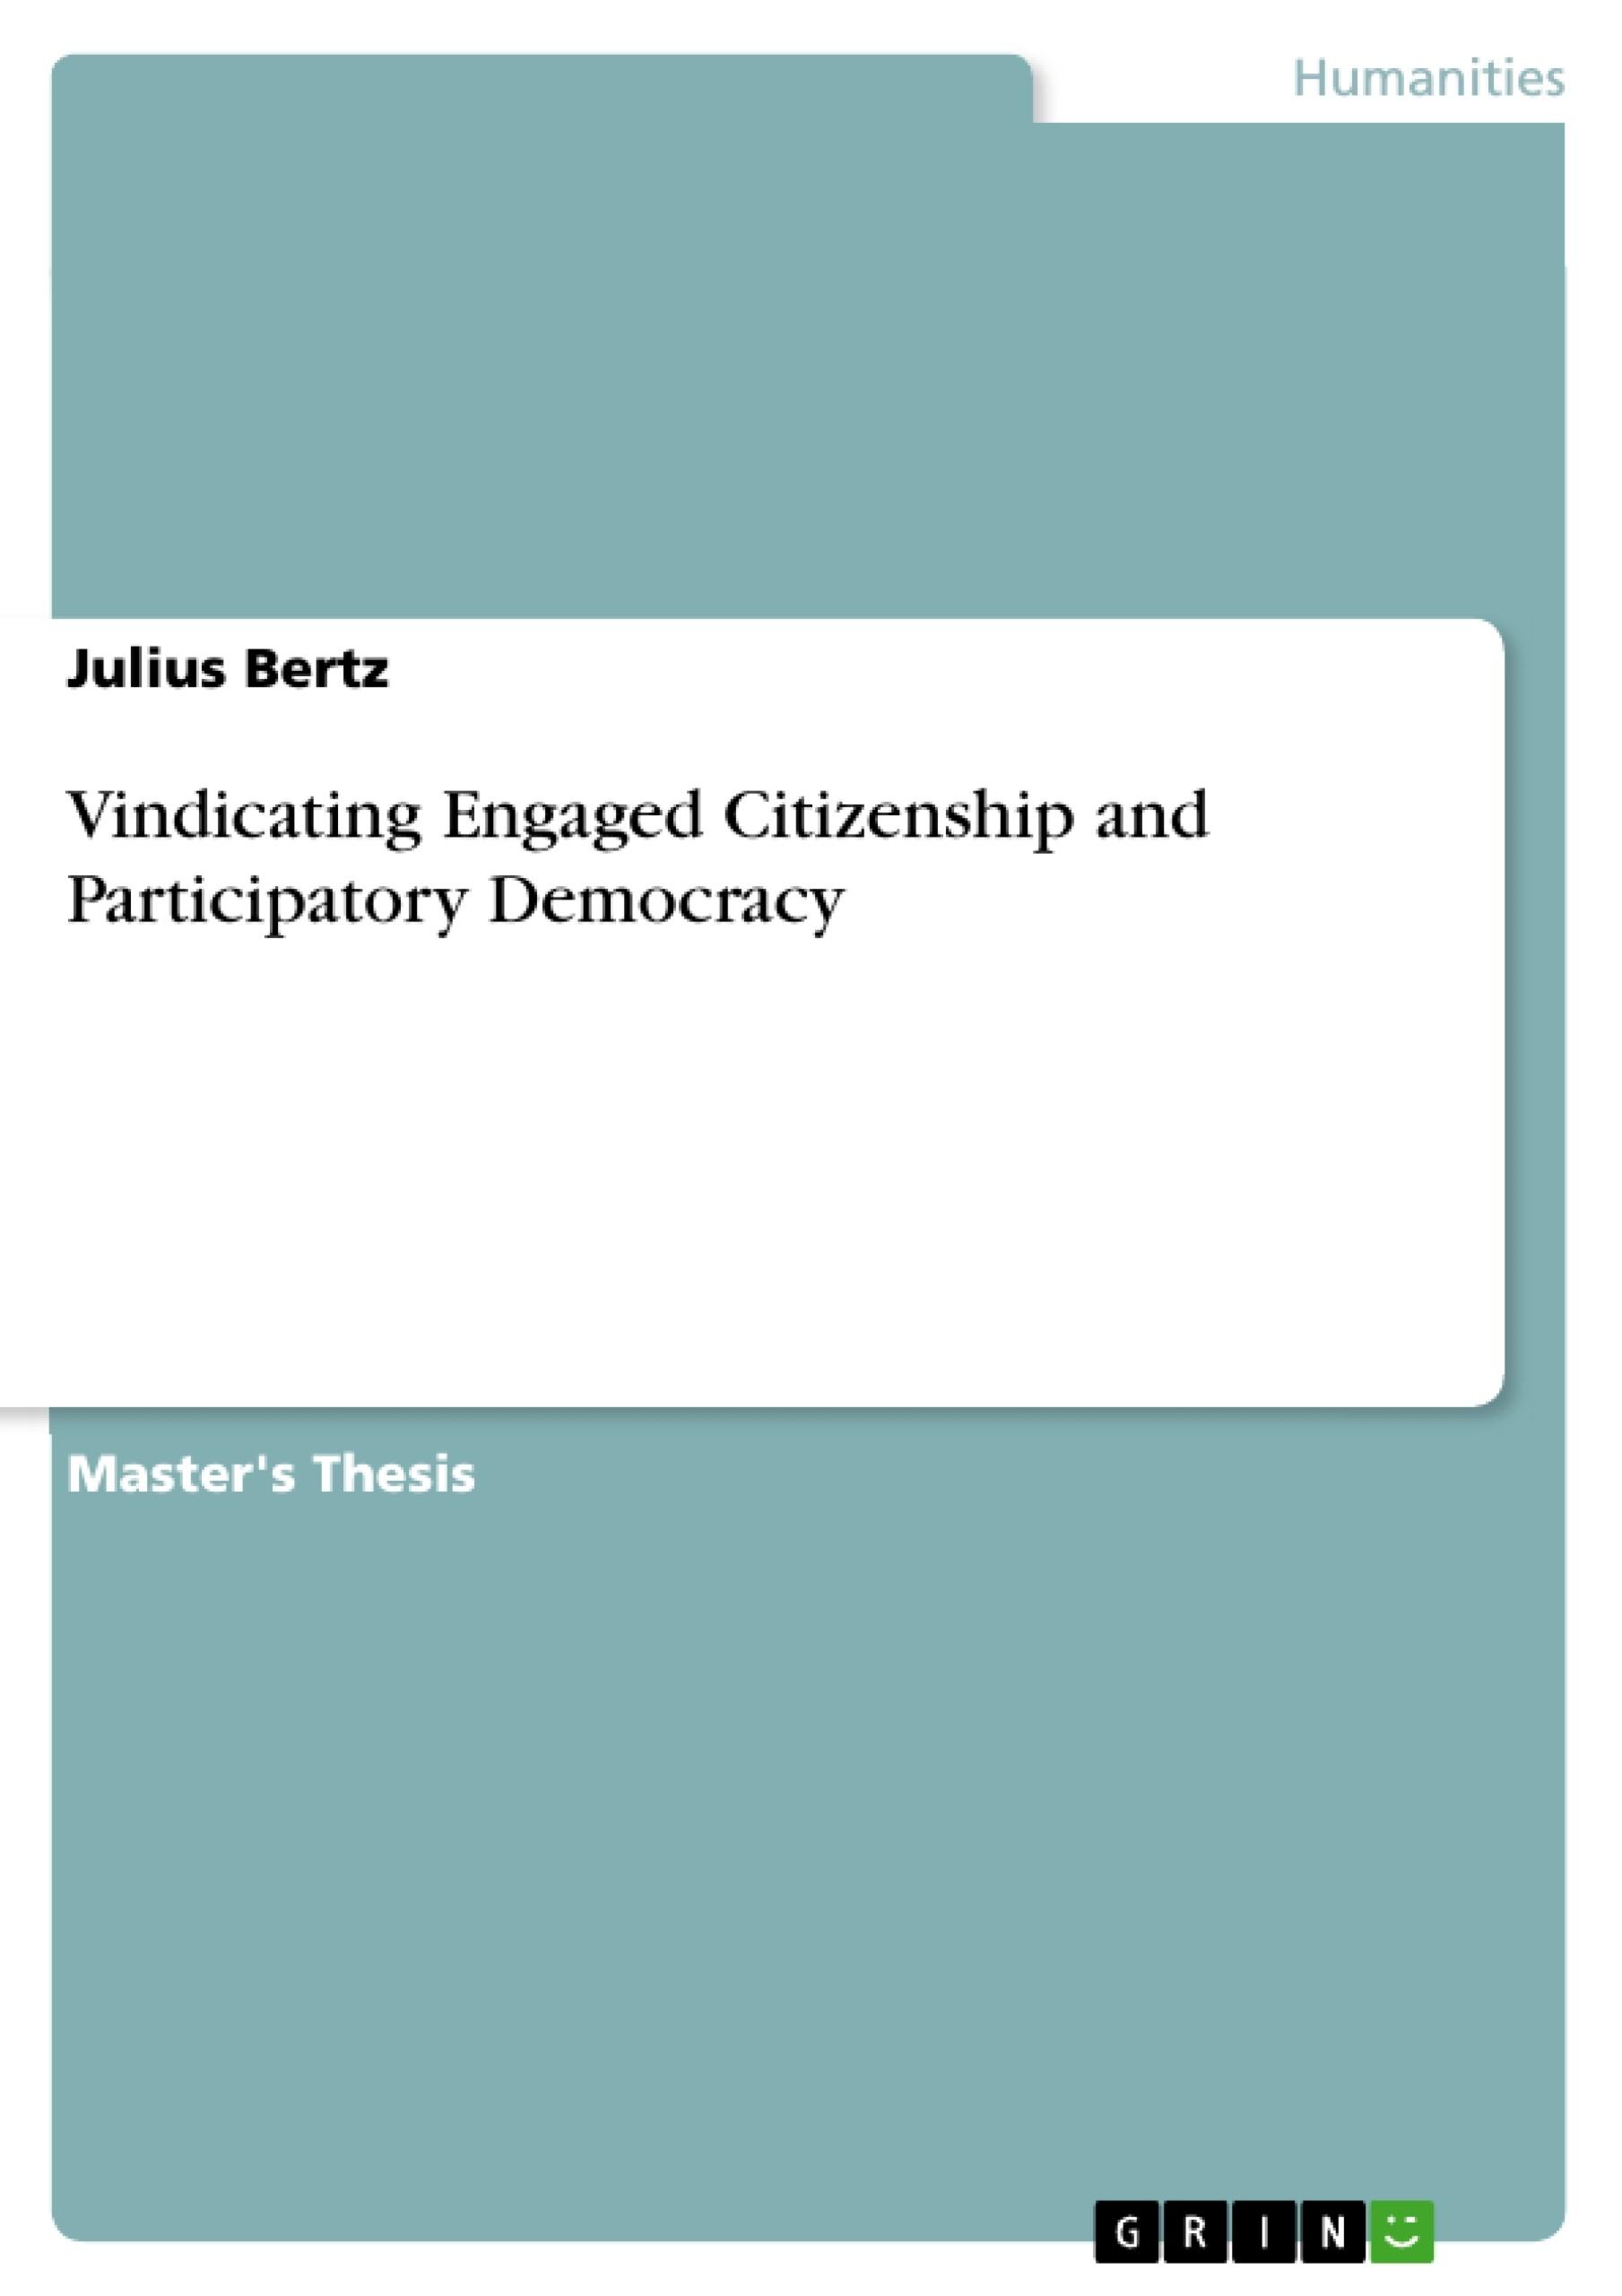 Title: Vindicating Engaged Citizenship and Participatory Democracy